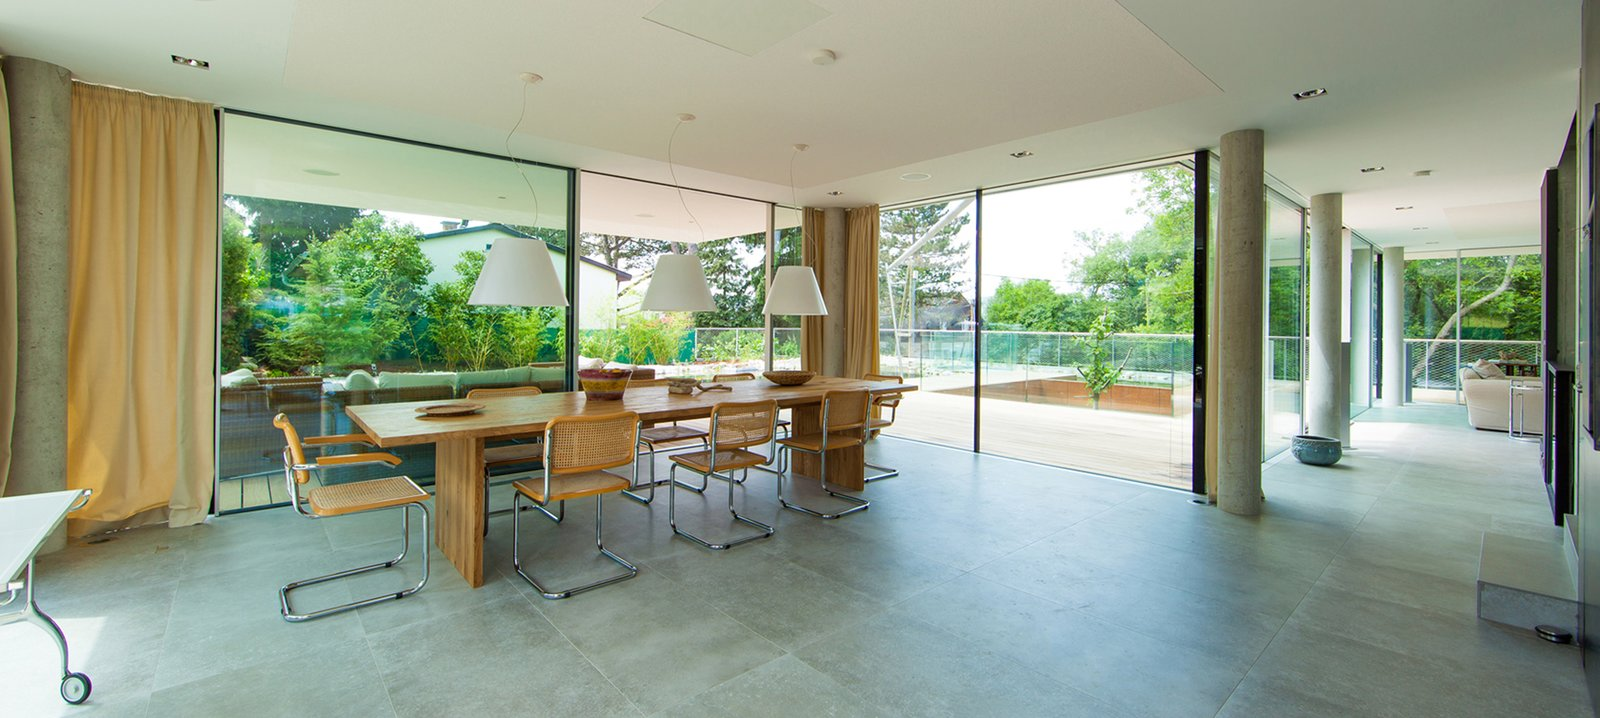 Dining room  360° Villa by Architect Zoran Bodrozic